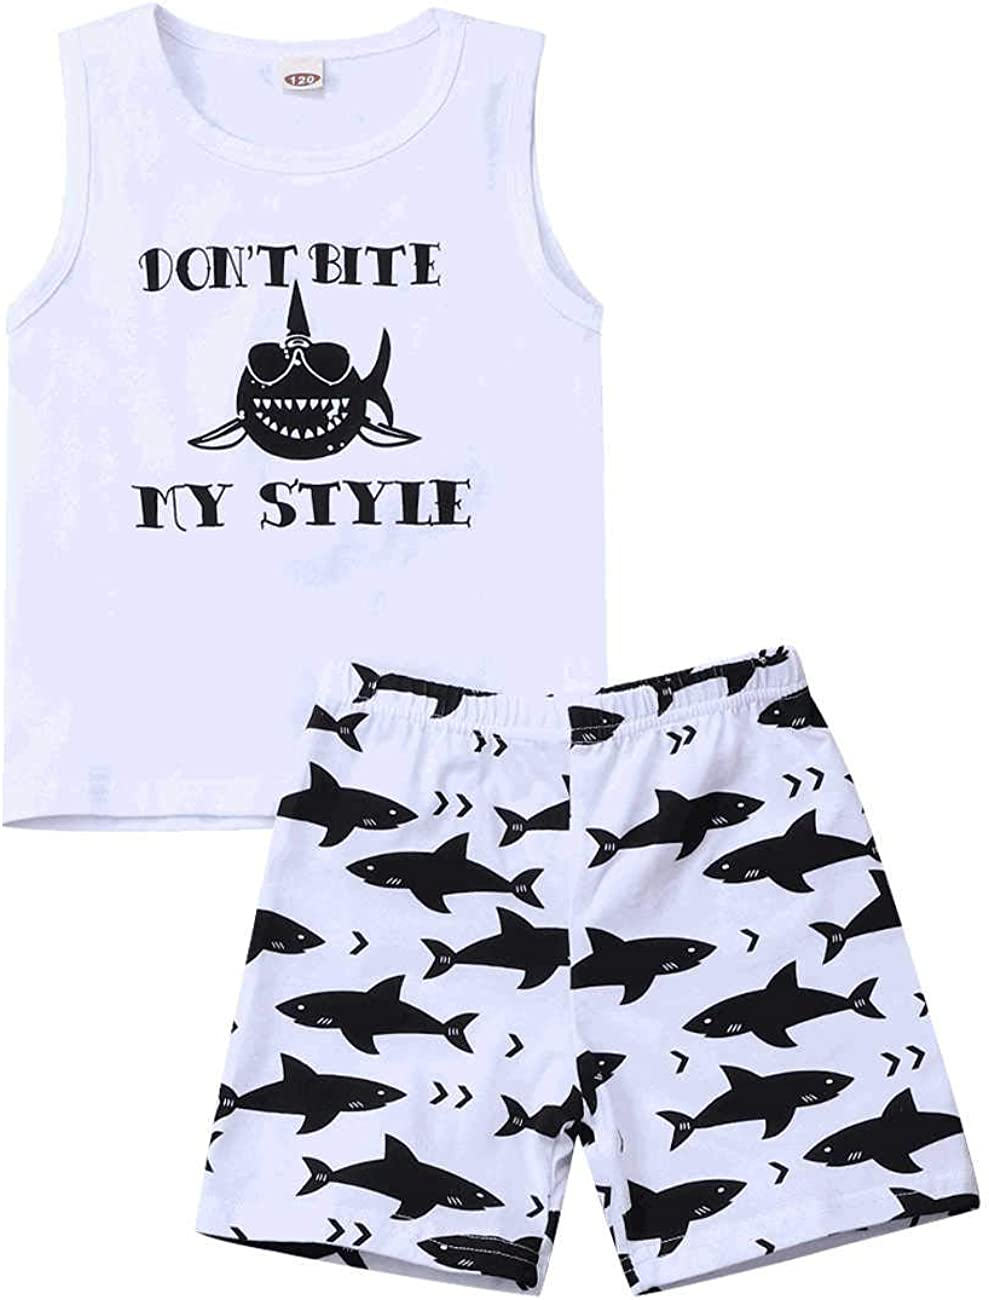 Toddler Baby Boys Shark Clothes Long Sleeve Tops Shirts + Pants Outfits Set